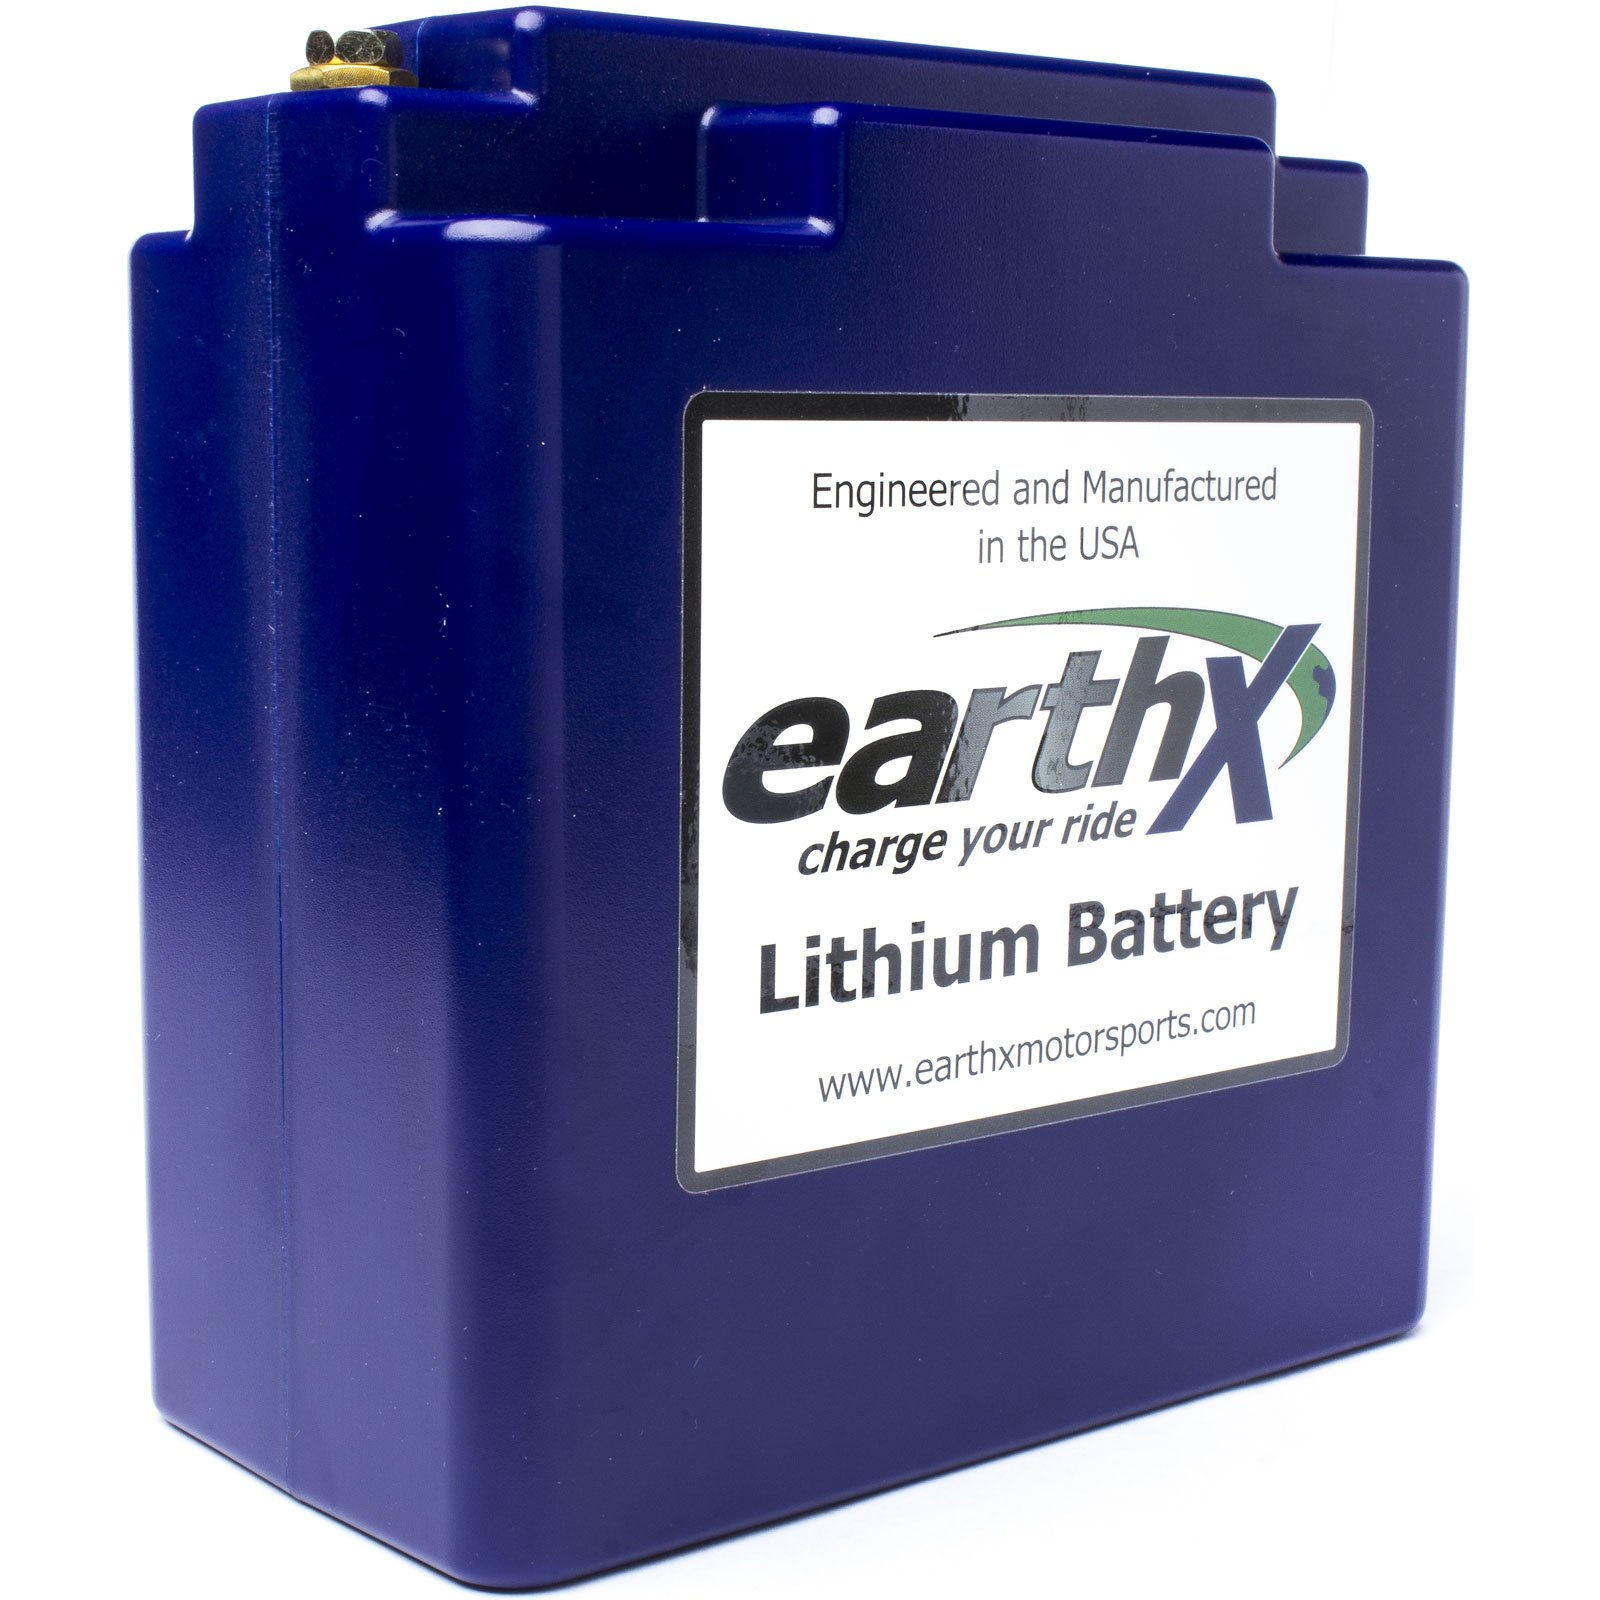 Earthx Etx1200 Lithium Battery For Experimental Aircraft